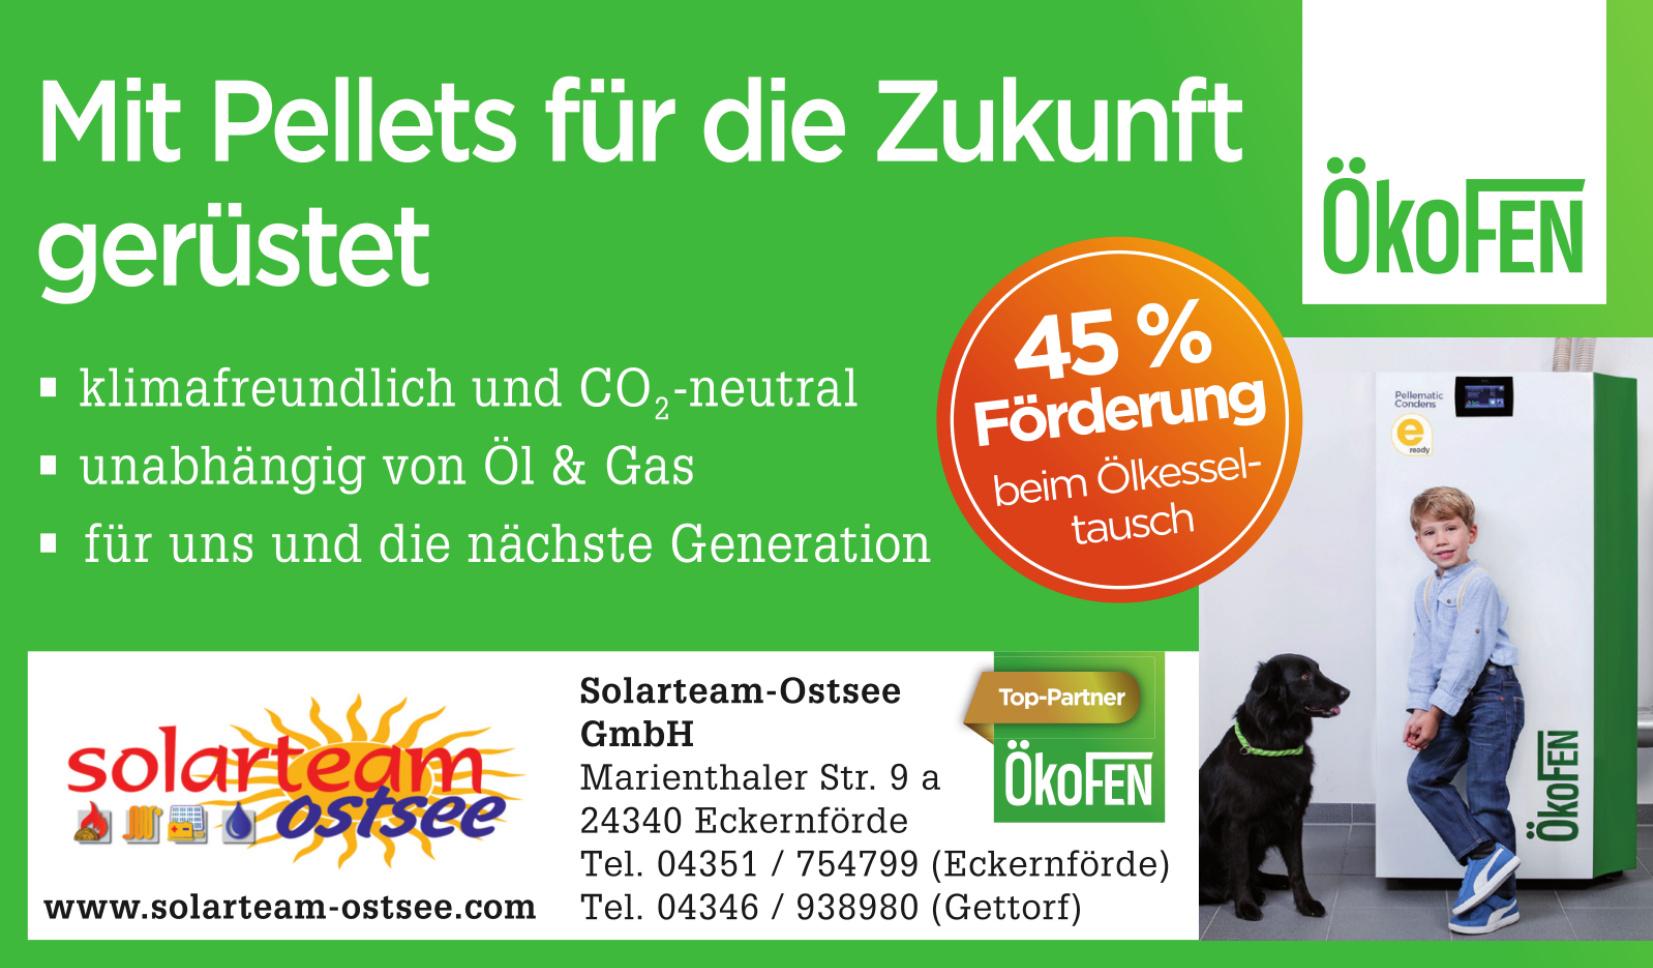 Solarteam Ostsee GbmH